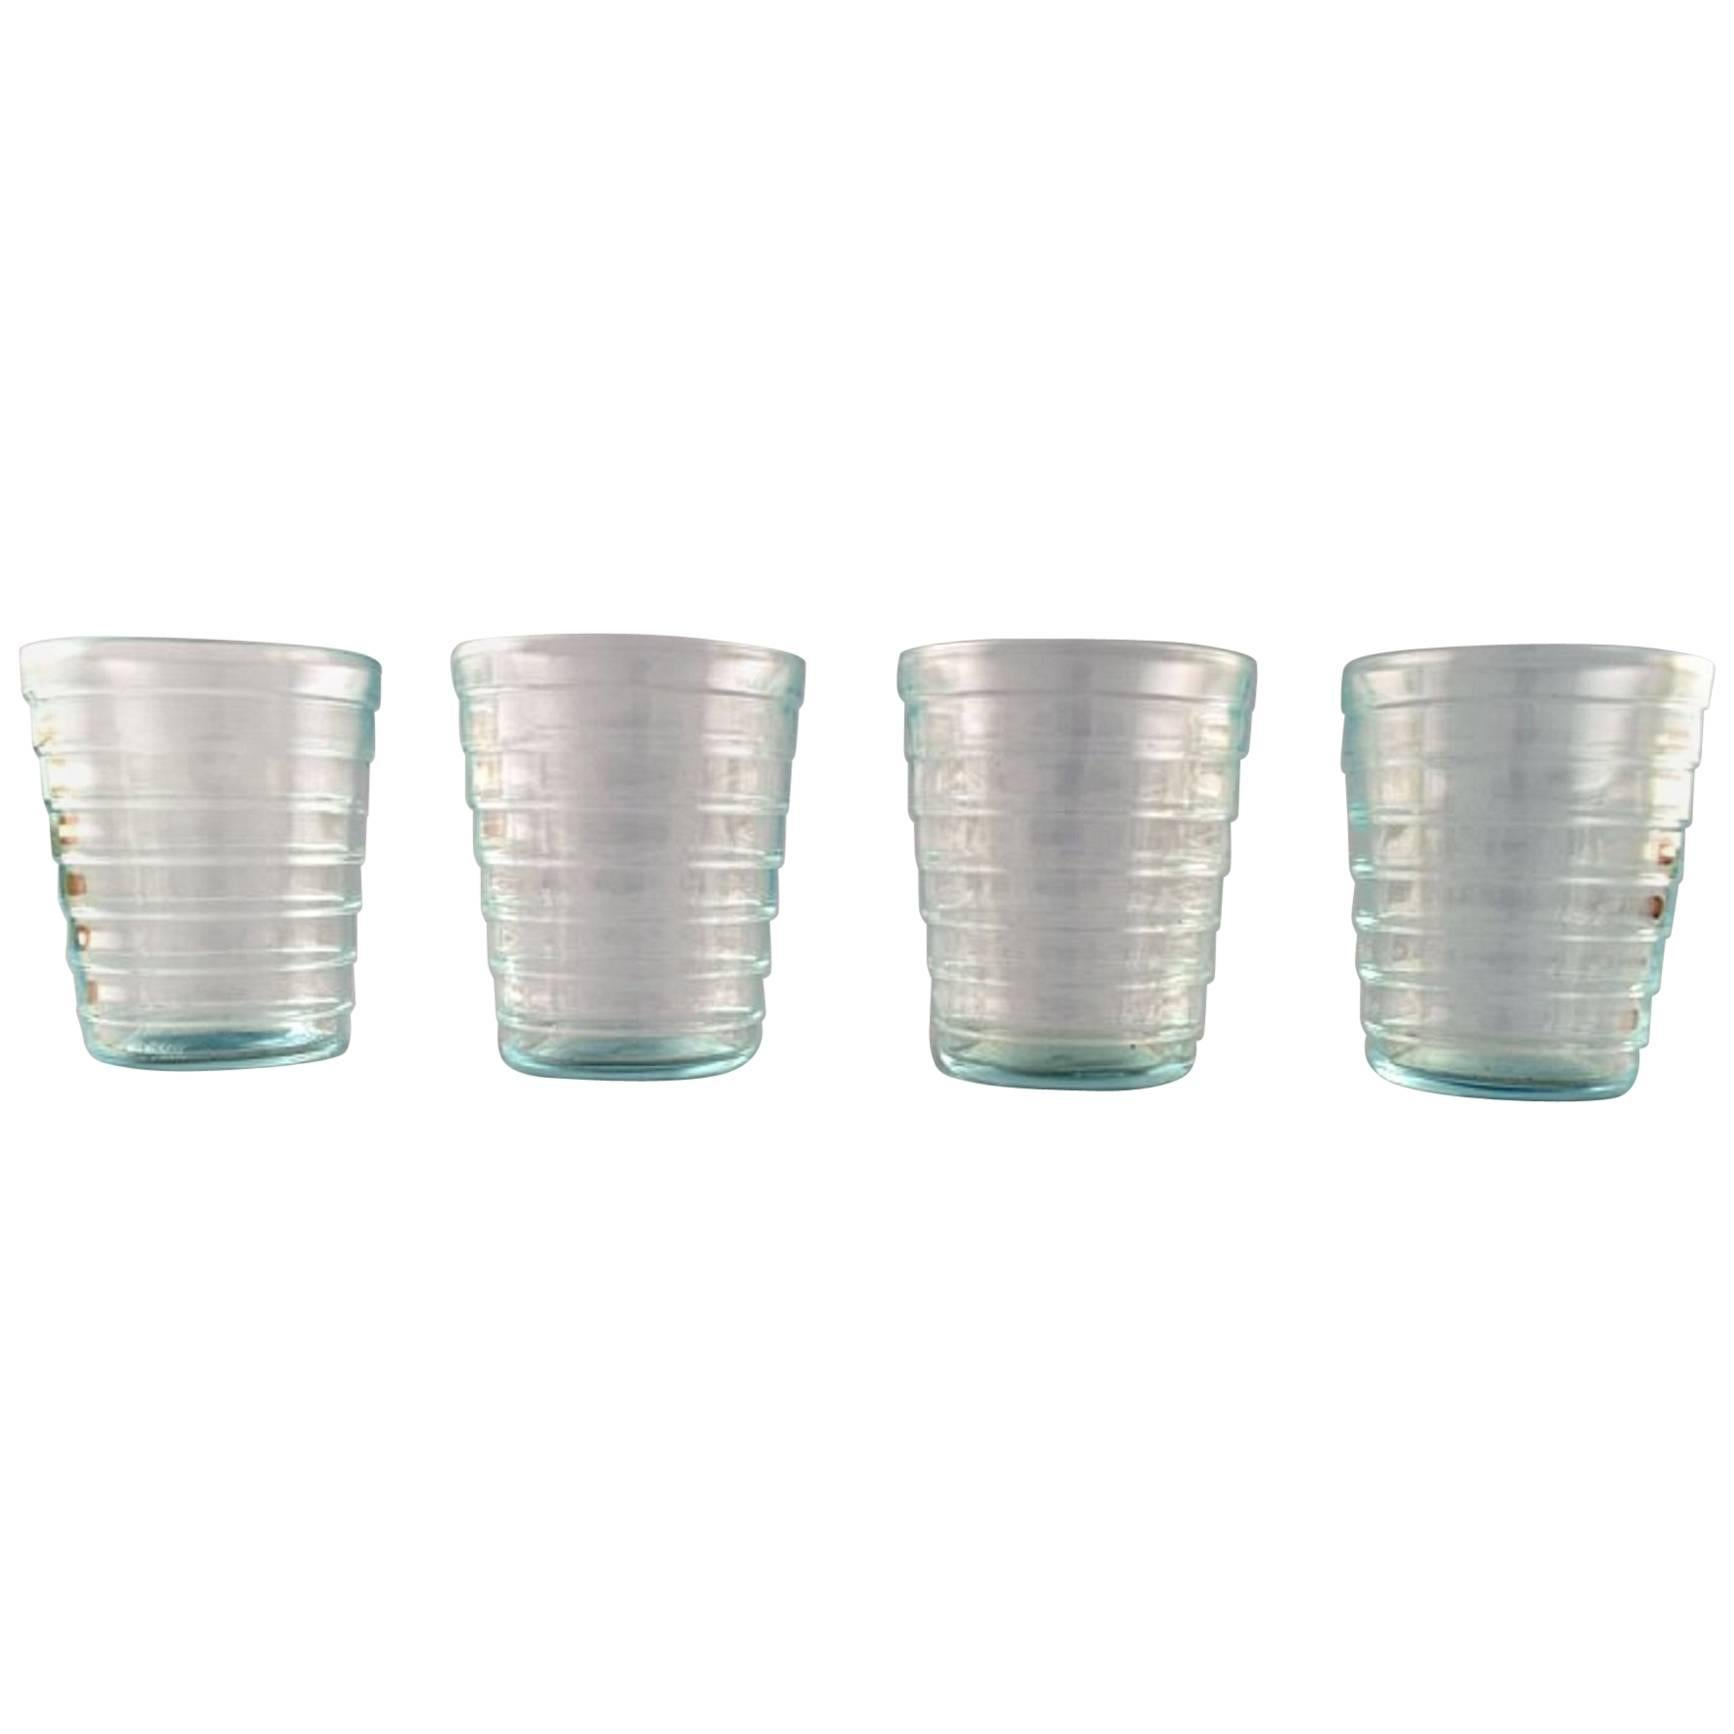 Kaj Franck 'Finnish, 1911-1989' Nuutajärvi Glass Works, Four Drinking Glasses